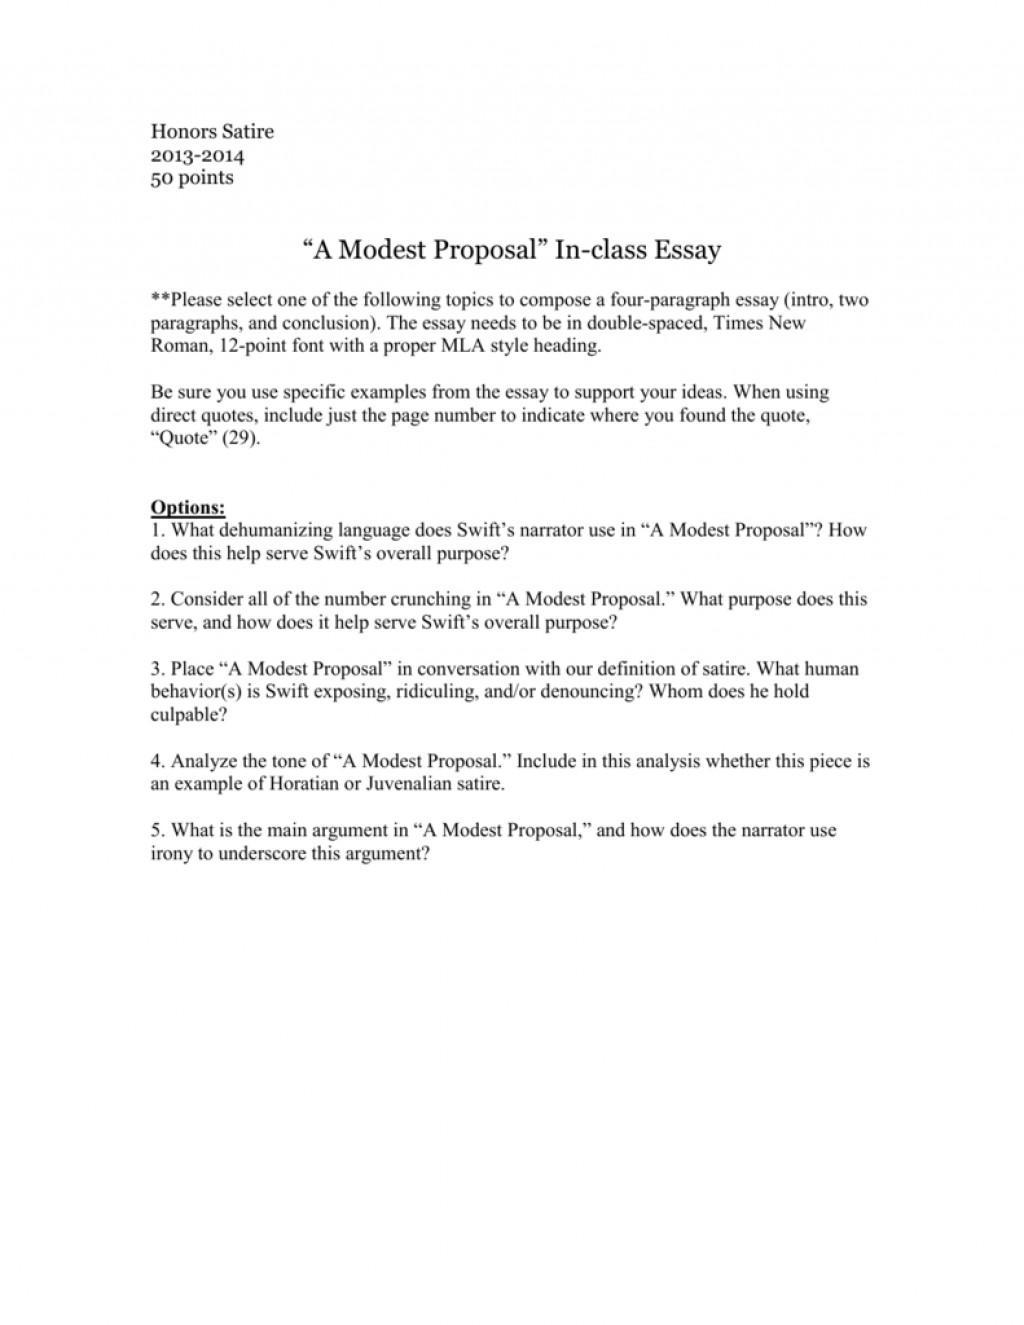 004 006676987 1 Modest Proposal Essay Exceptional Conclusion Topics Prompts Large